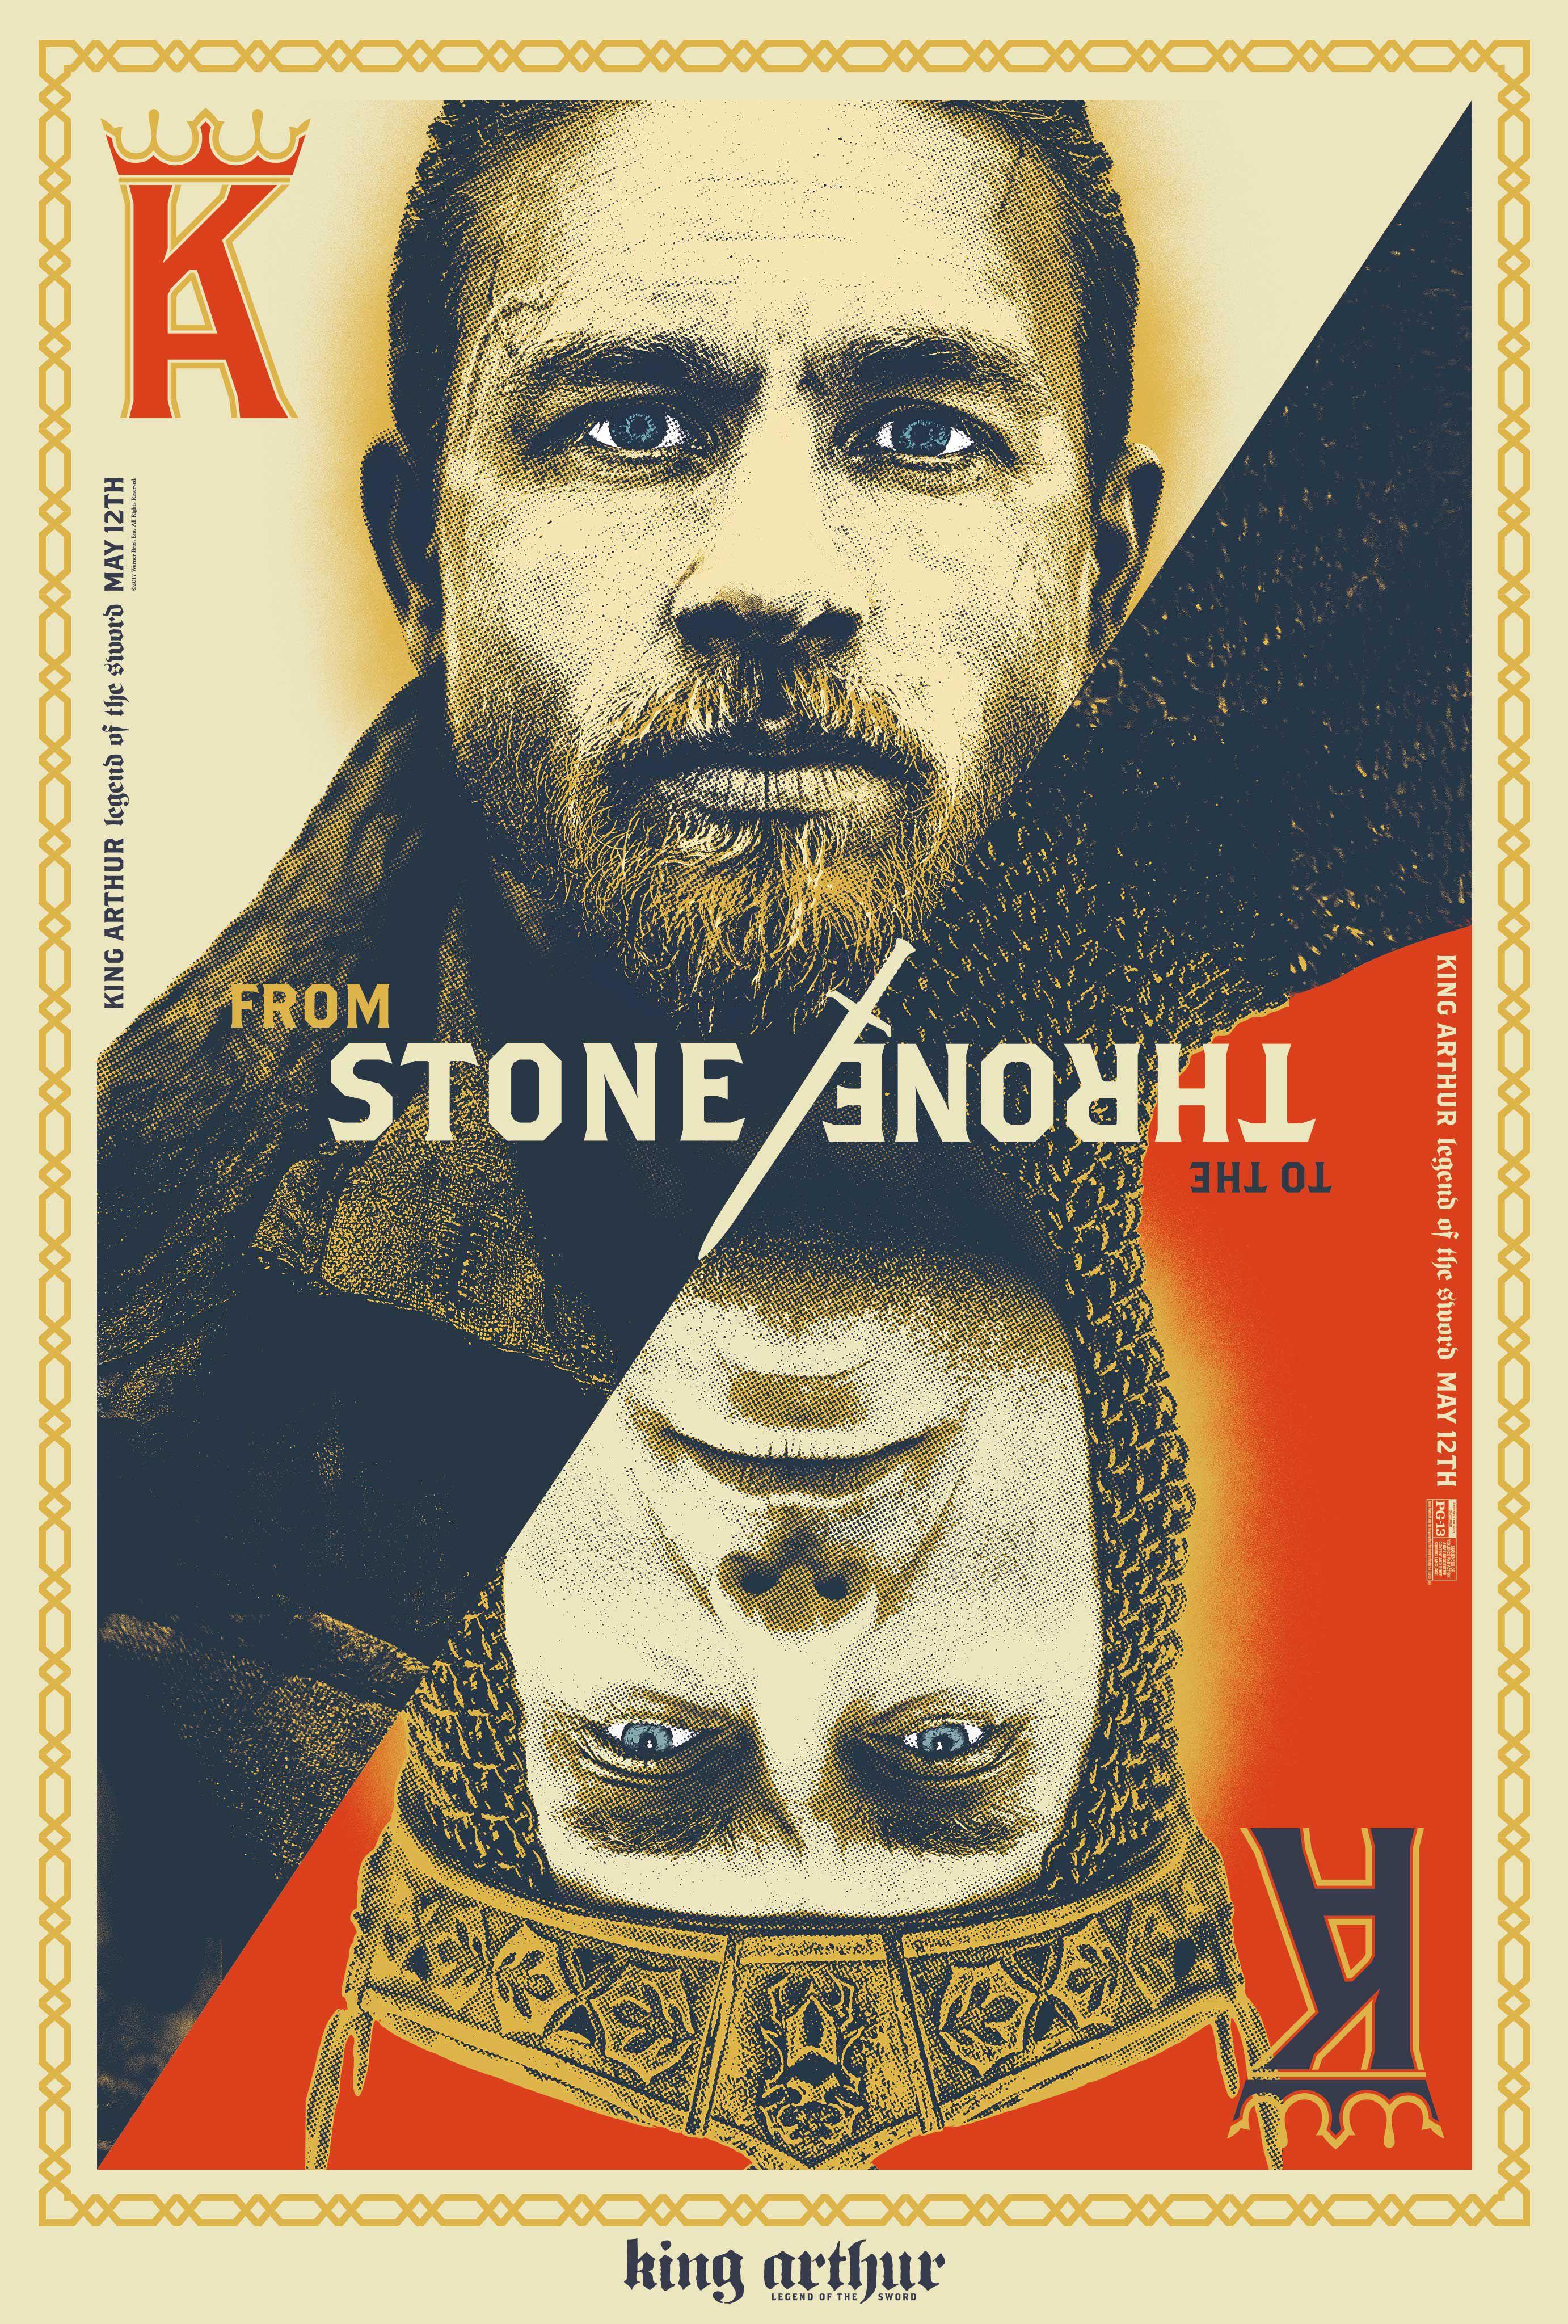 Pin By Sunil On Films King Arthur Legend King Arthur Movie